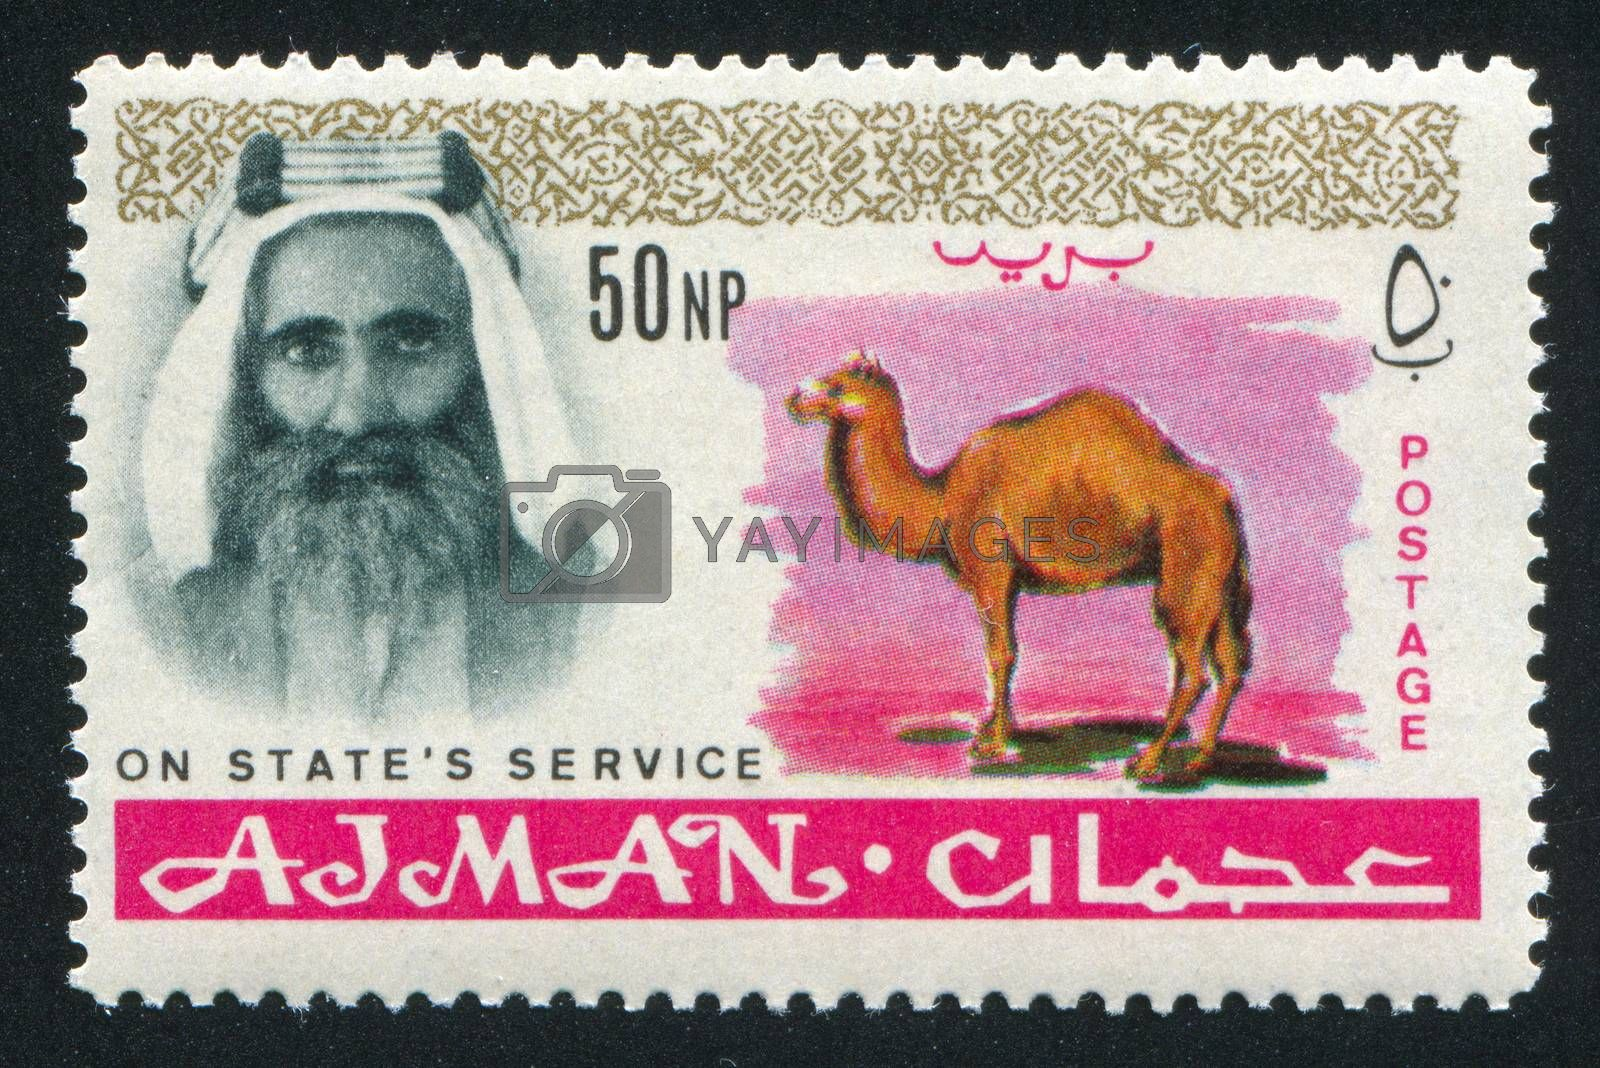 AJMAN - CIRCA 1964: stamp printed by Ajman, shows Sheik Rashid bin Humaid al Naimi and camel, circa 1964